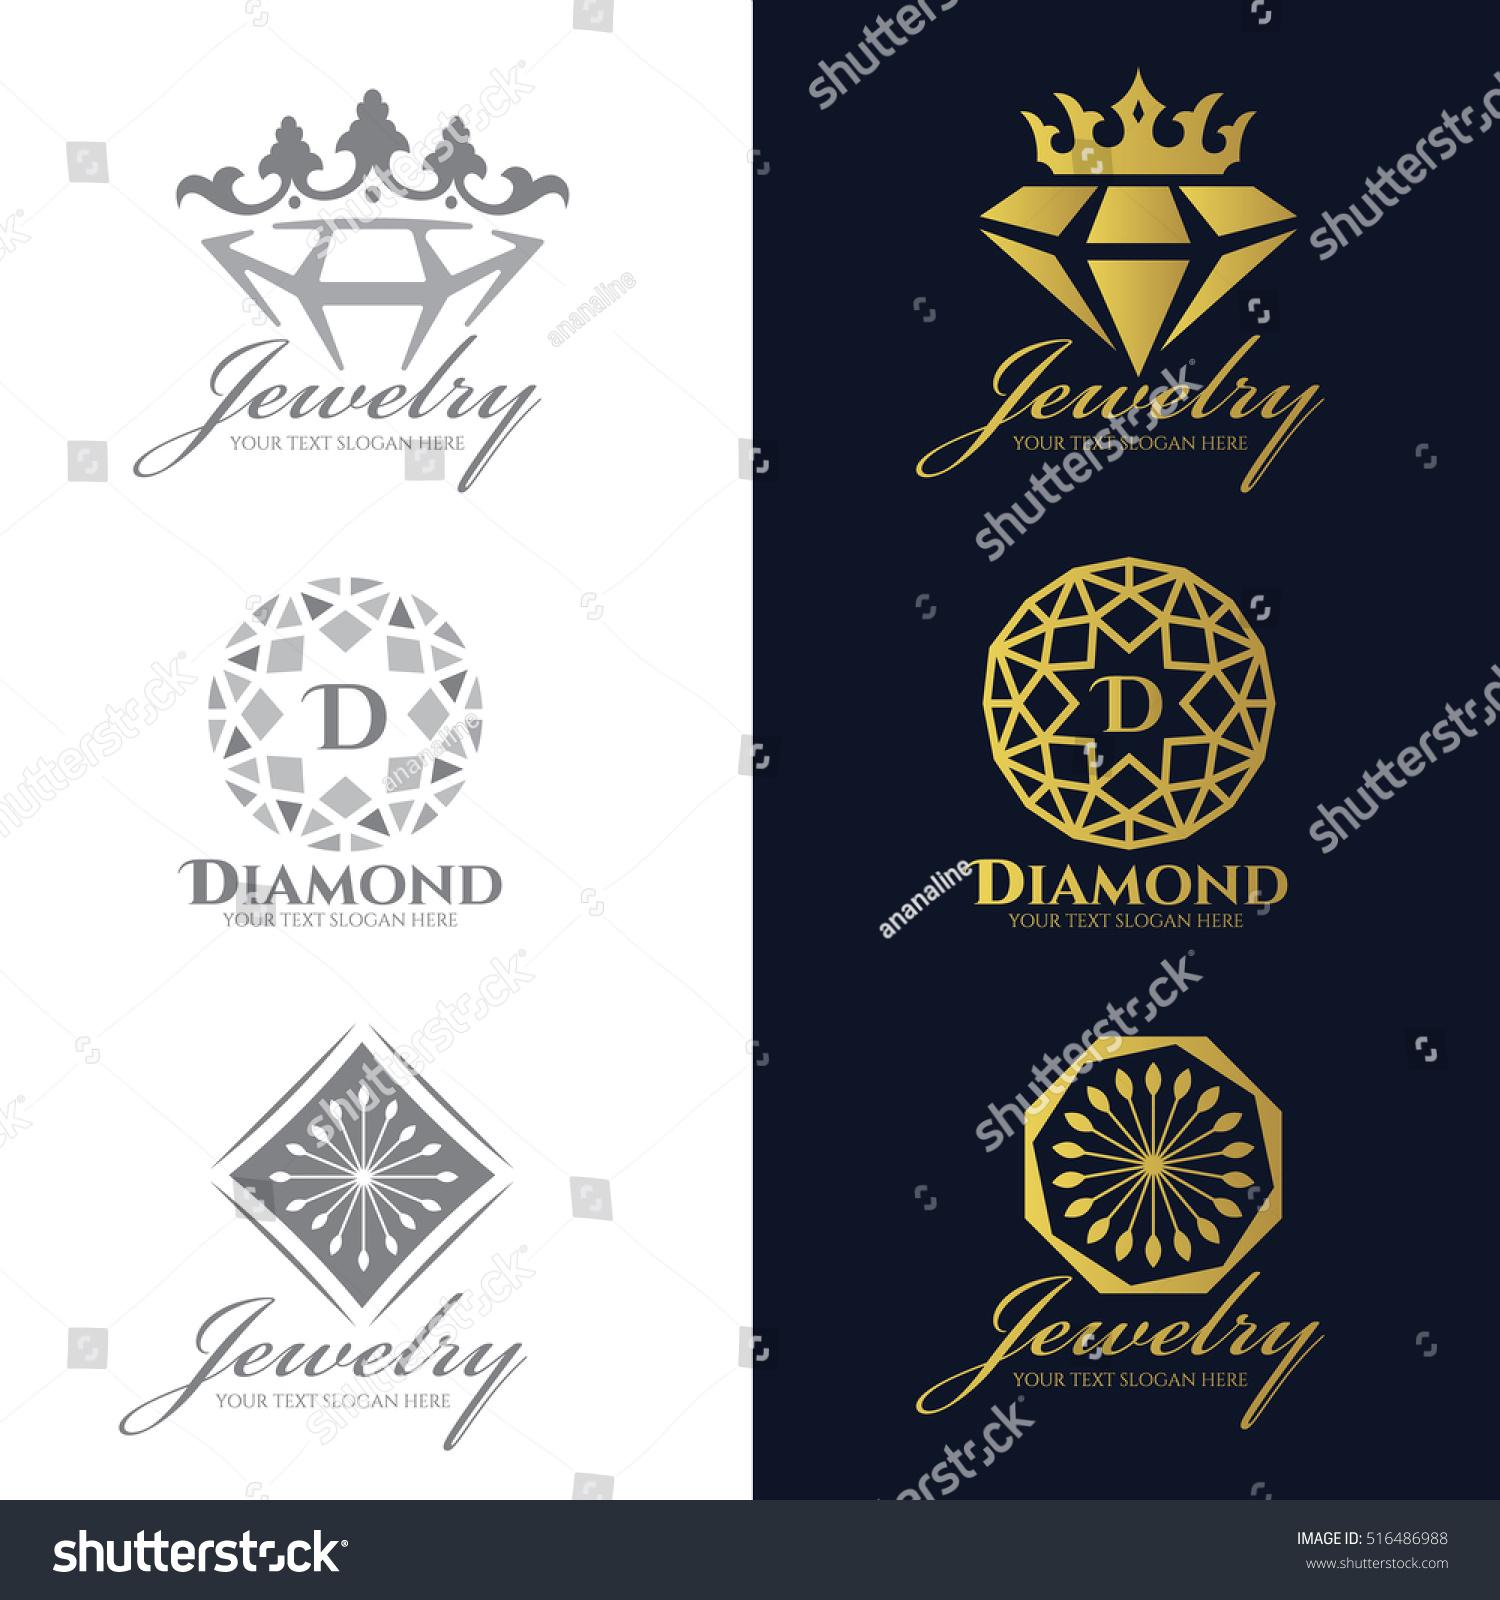 684e4d768ca3 Jewelry Logo Crown Diamond Flower Vector Stock Vector (Royalty Free .